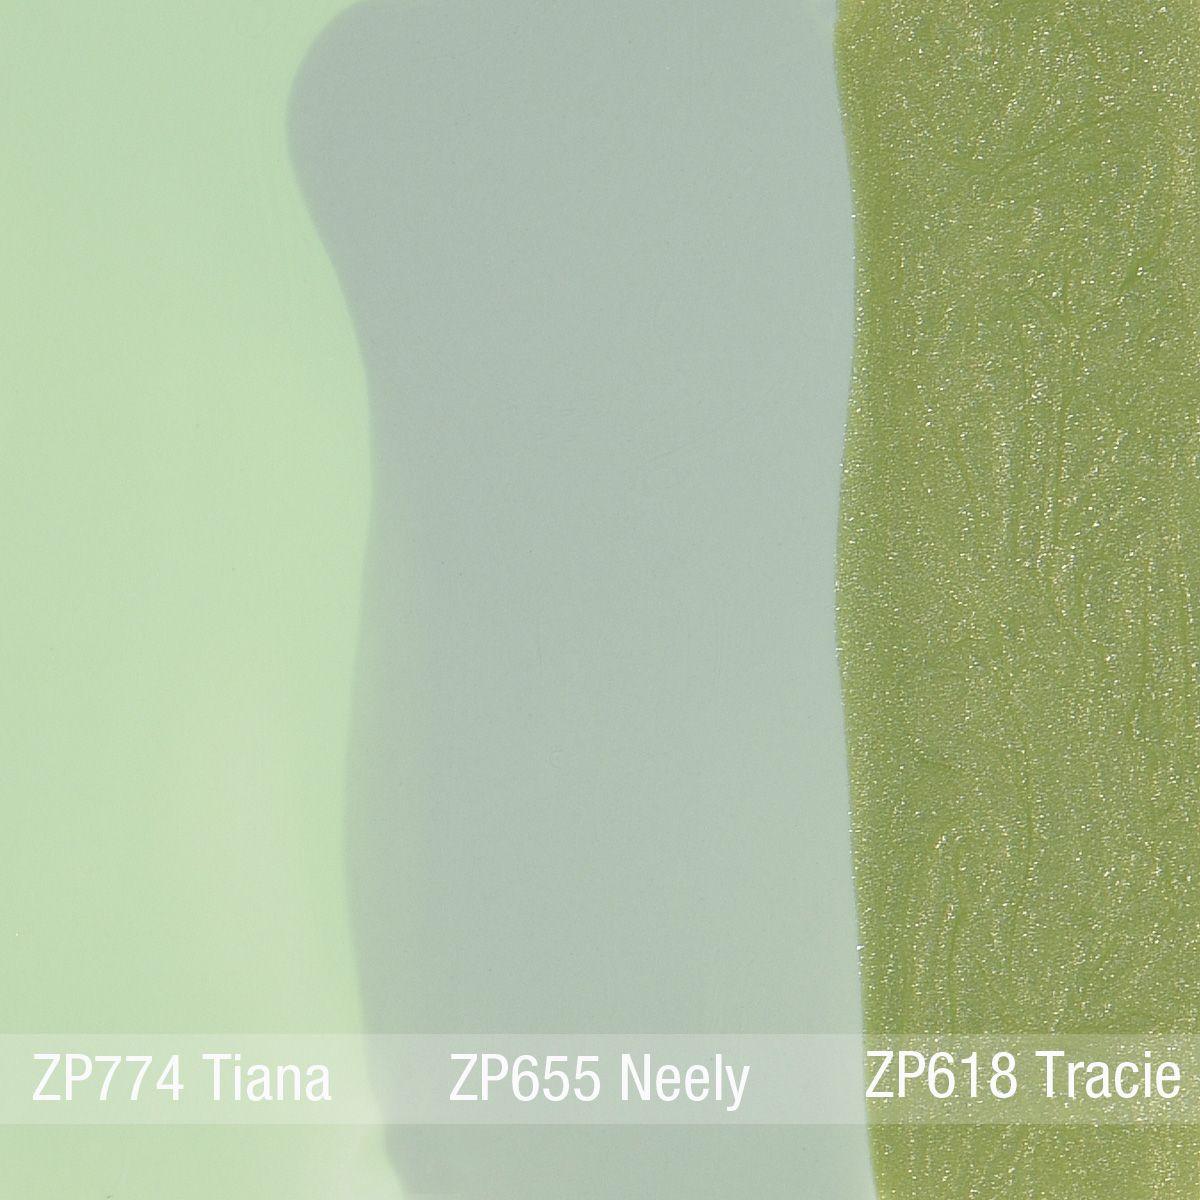 Zoya Tiana, Neely, and Tracie compared